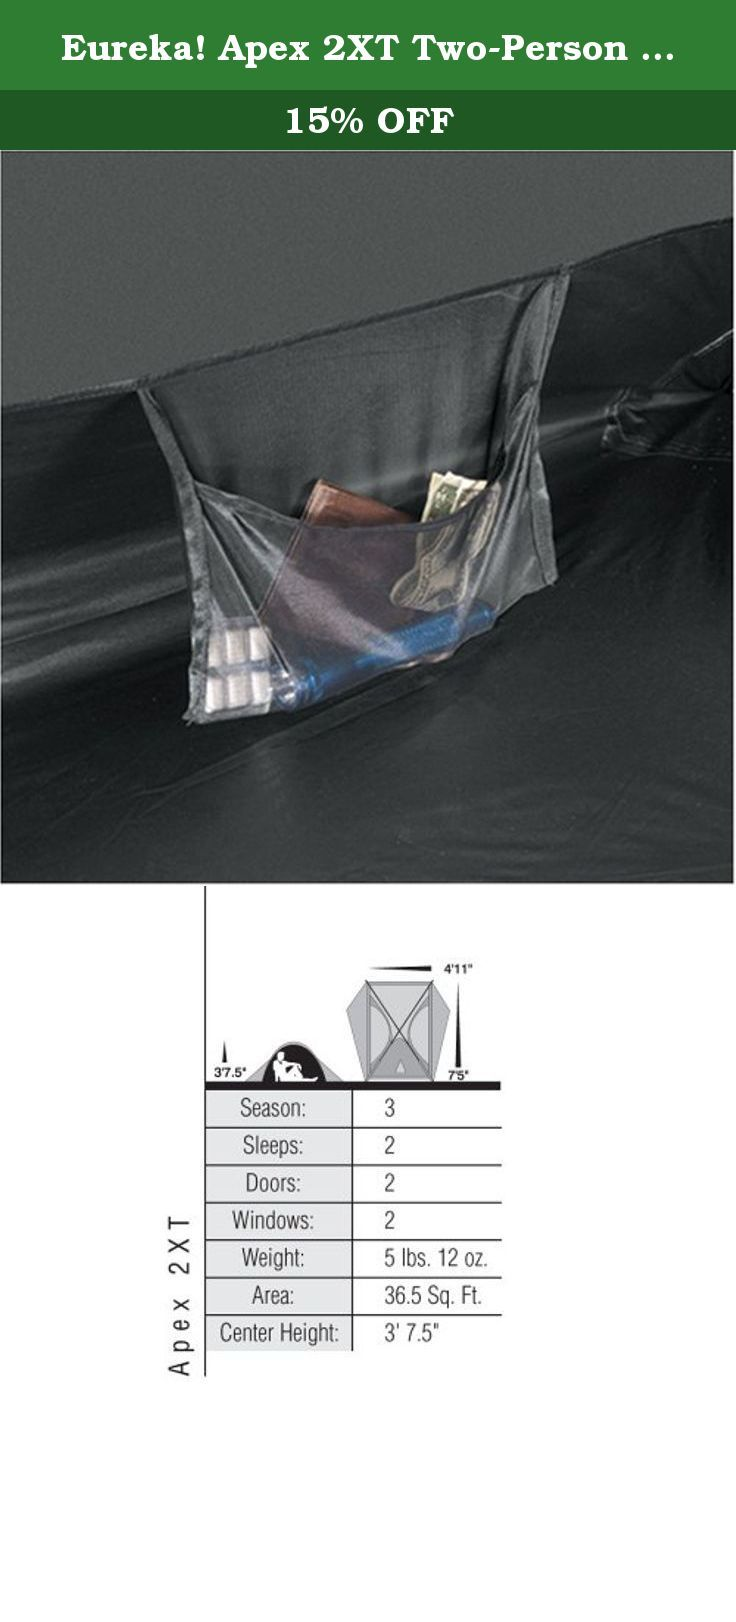 Eureka! Apex 2XT Two-Person Tent. Original Apex styling with 2 mesh doors  sc 1 st  Pinterest & Eureka! Apex 2XT Two-Person Tent. Original Apex styling with 2 ...